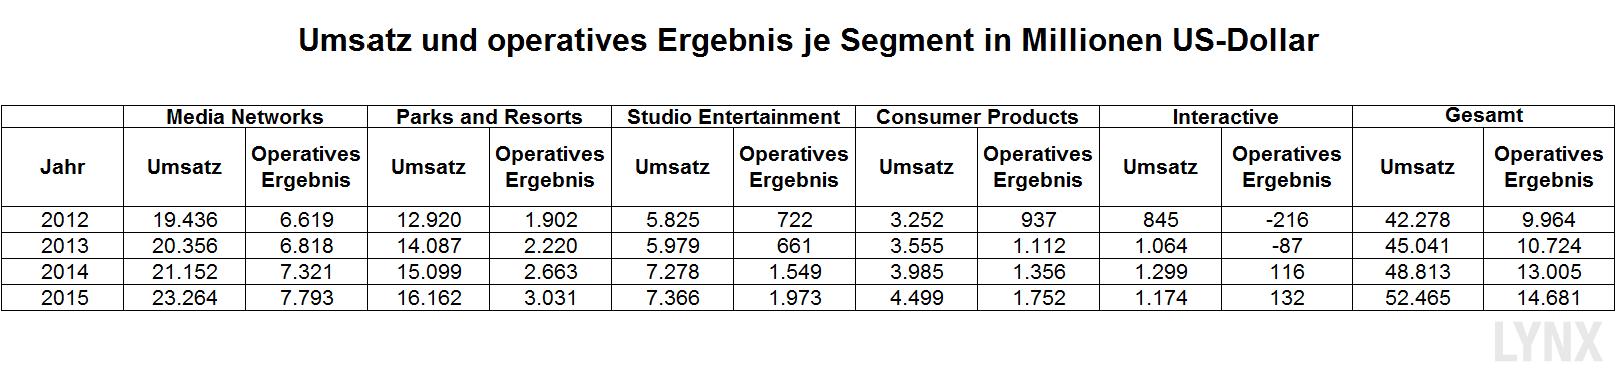 20151231-Umsatz-operatives-Ergebnis-walt-disney-lynx